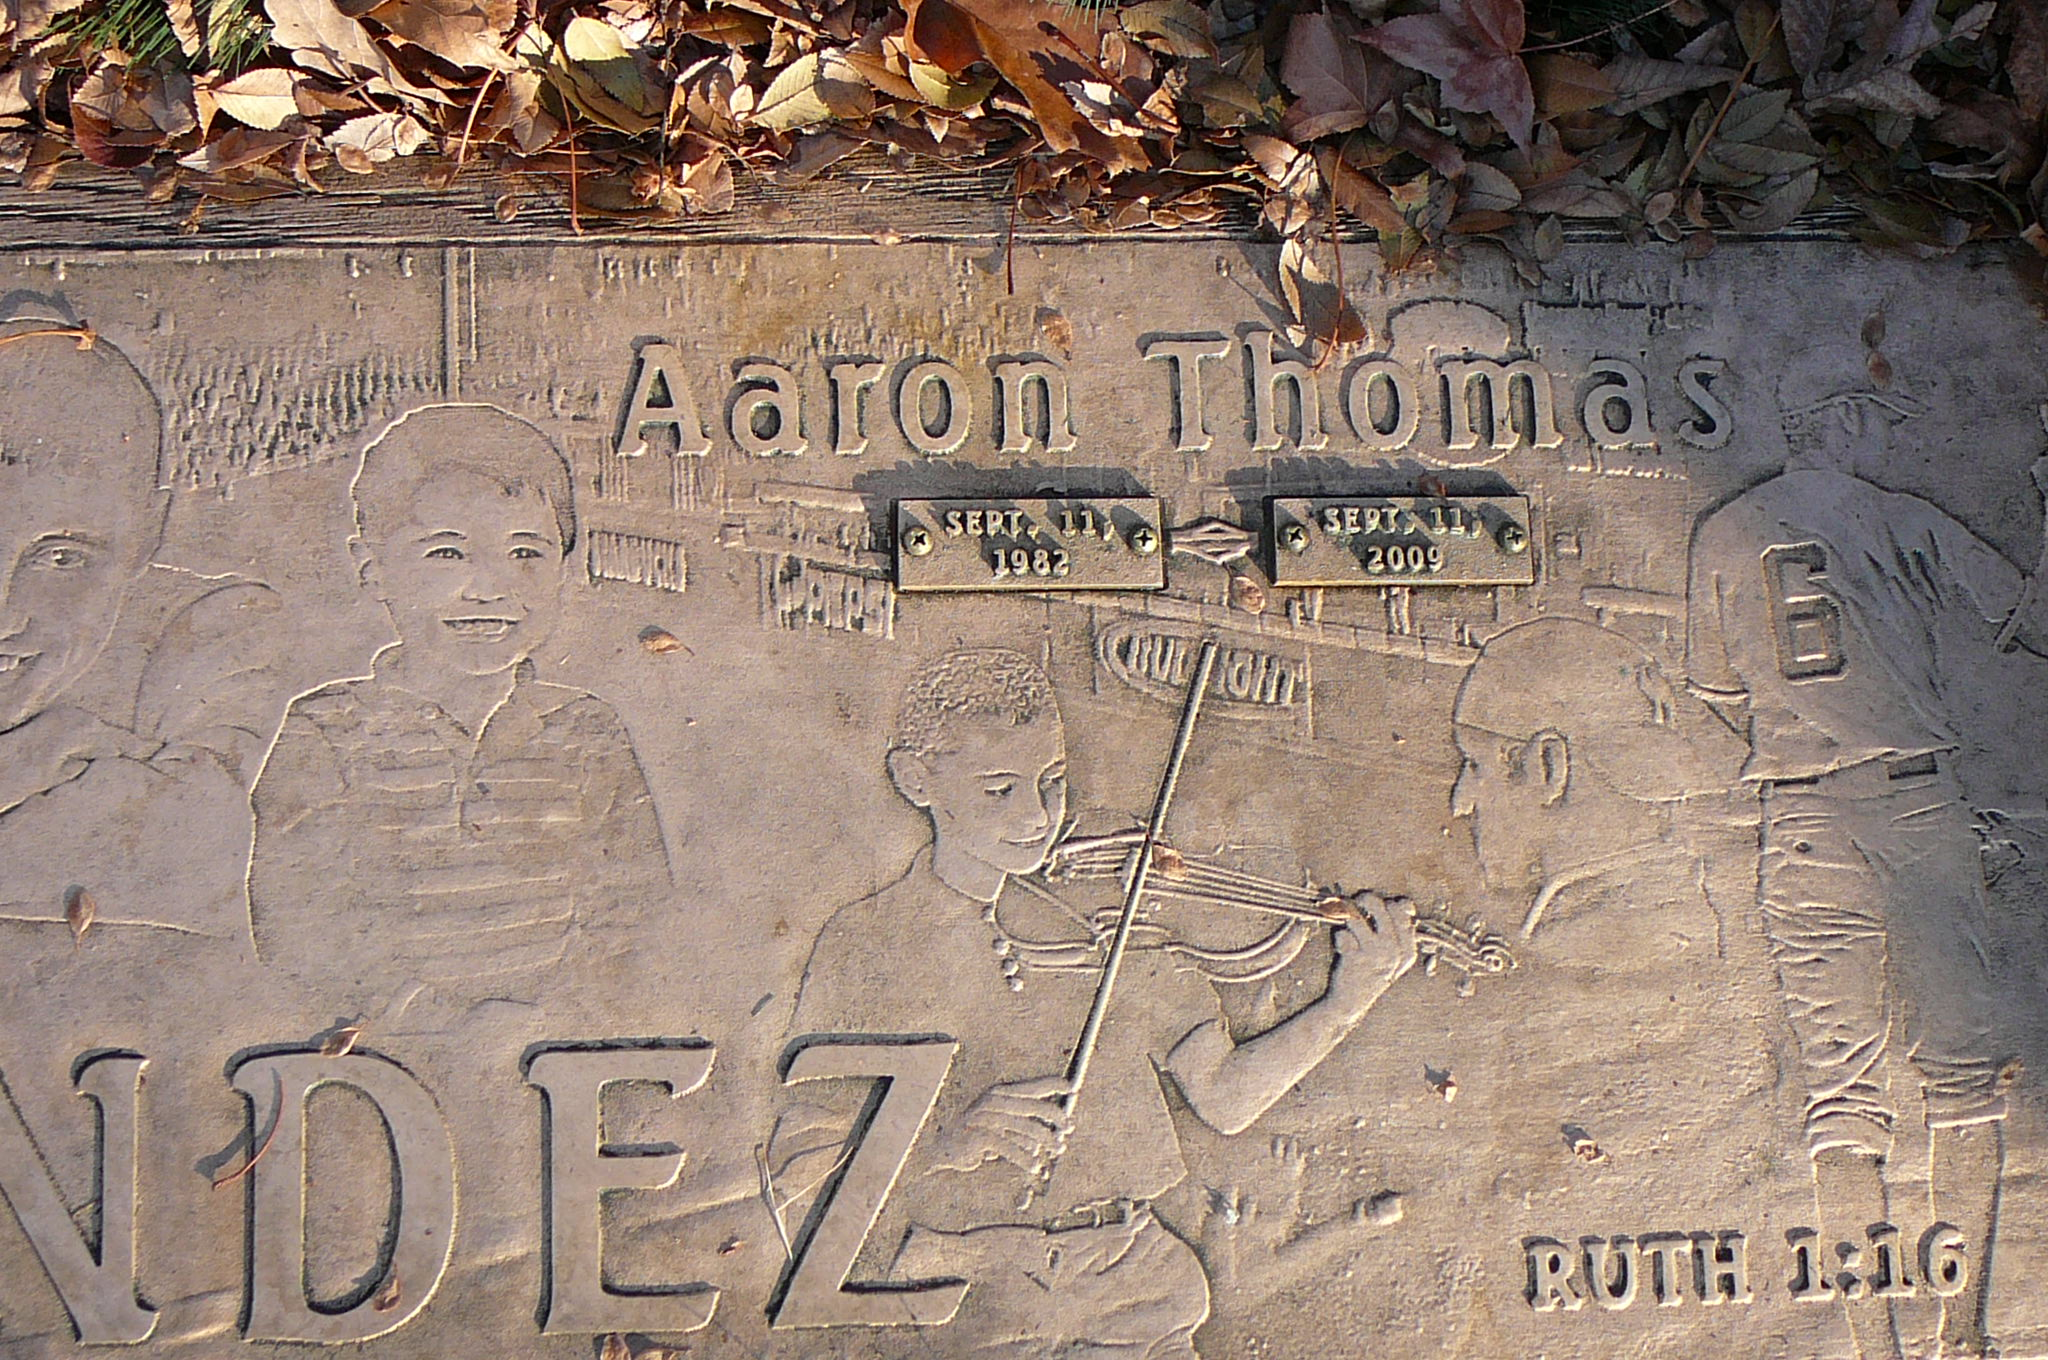 Aaron Thomas Hernandez 1982 2009 Find A Grave Memorial